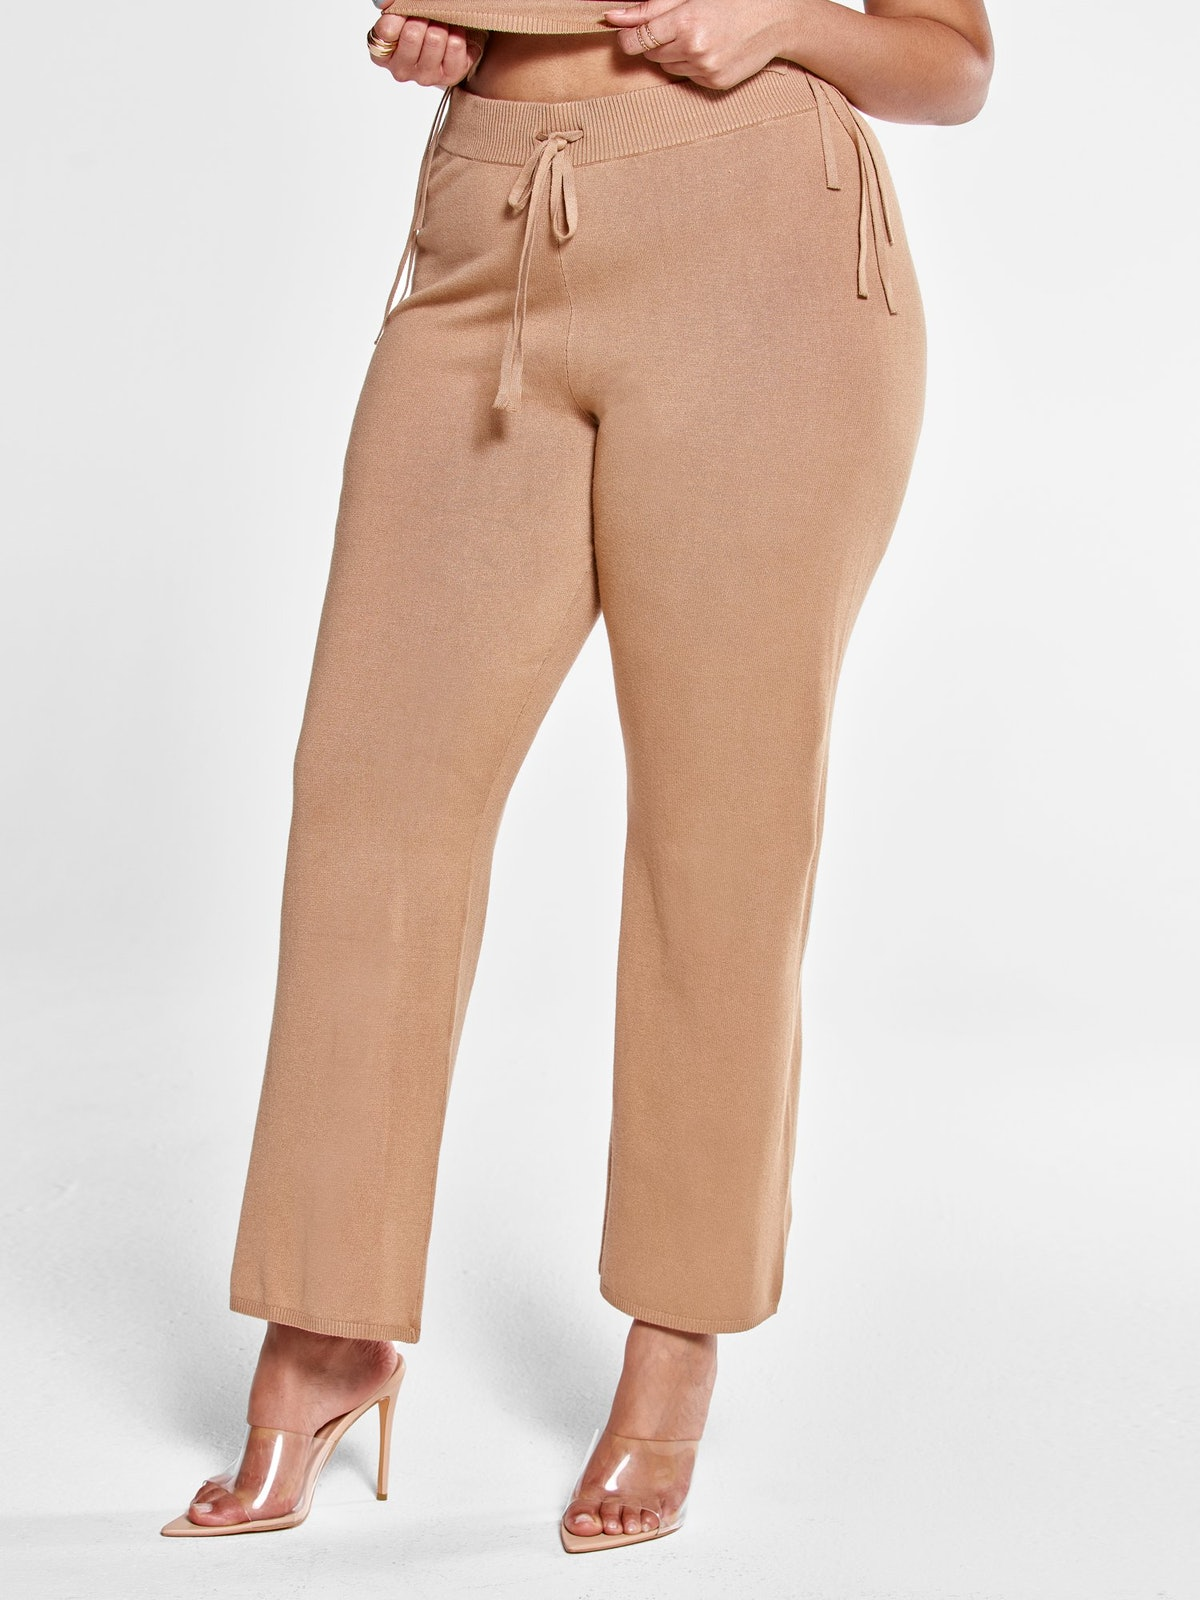 Deana Drawstring Knit Pants in Tan